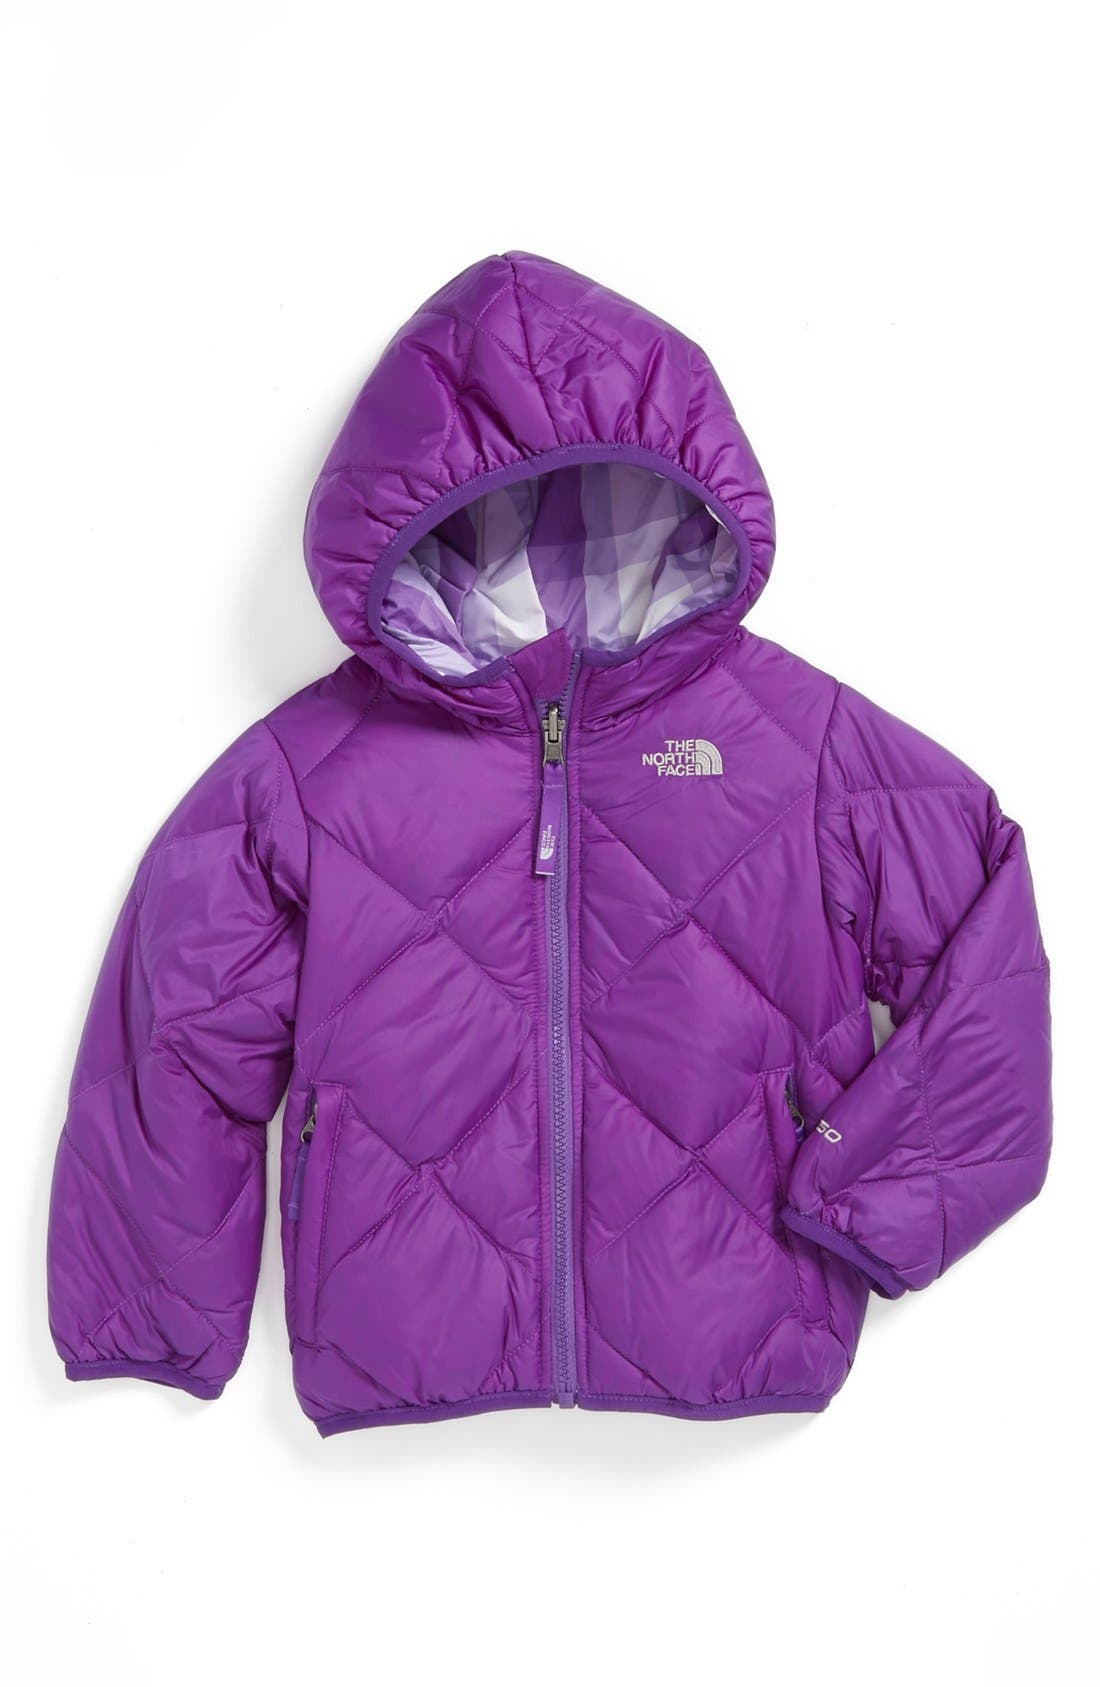 Alternate Image 1 Selected - The North Face 'Moondoggy' Reversible Jacket (Toddler Girls)